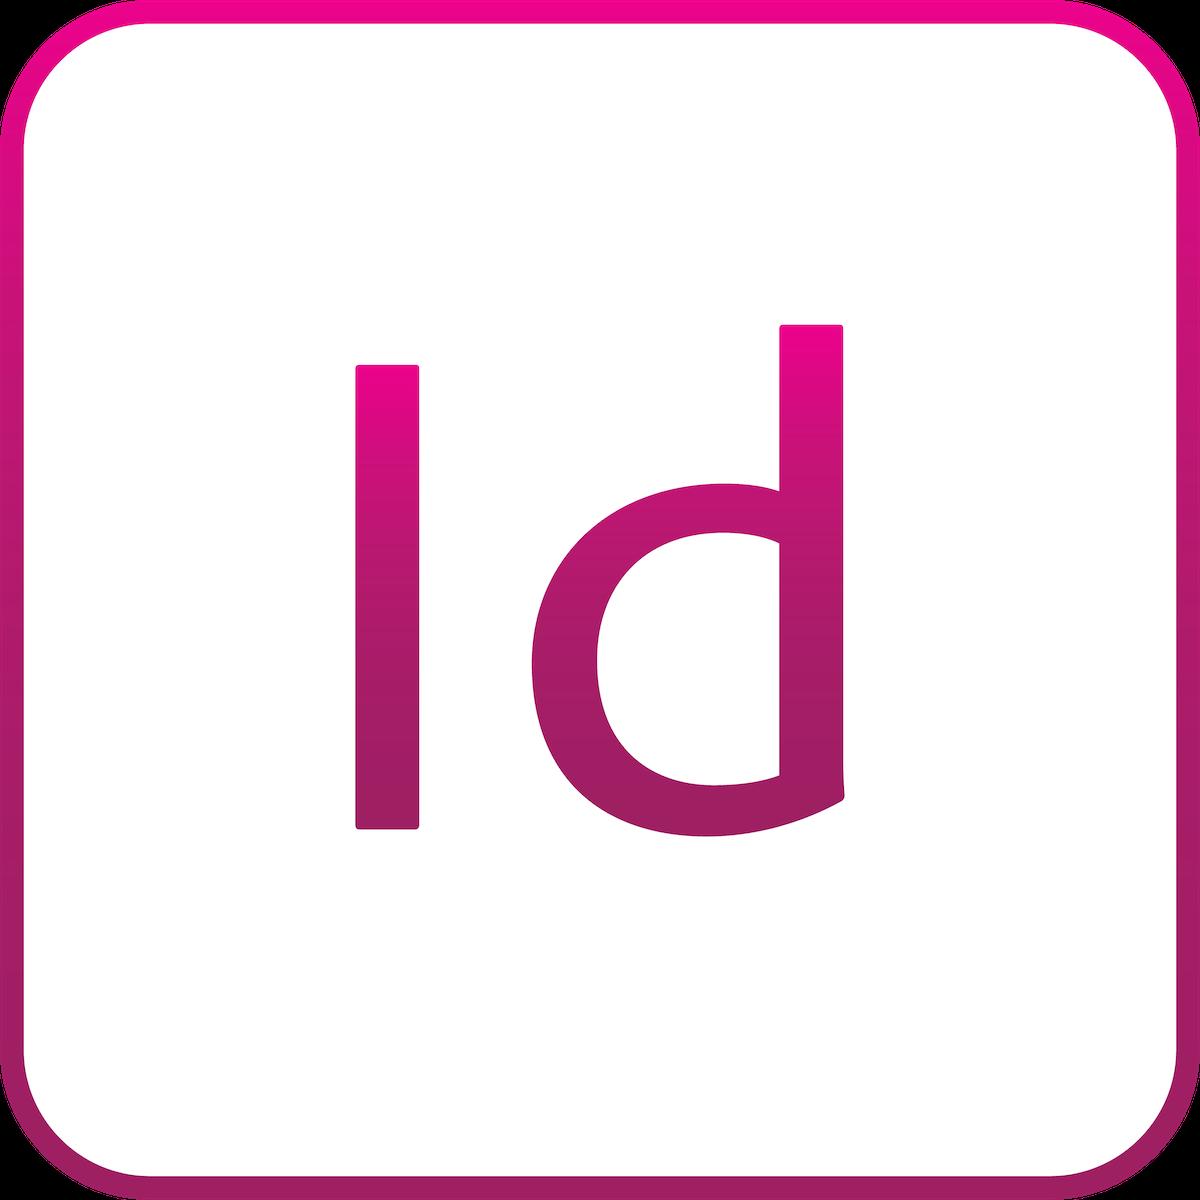 Indesign Tech Company Logos Company Logo Vimeo Logo